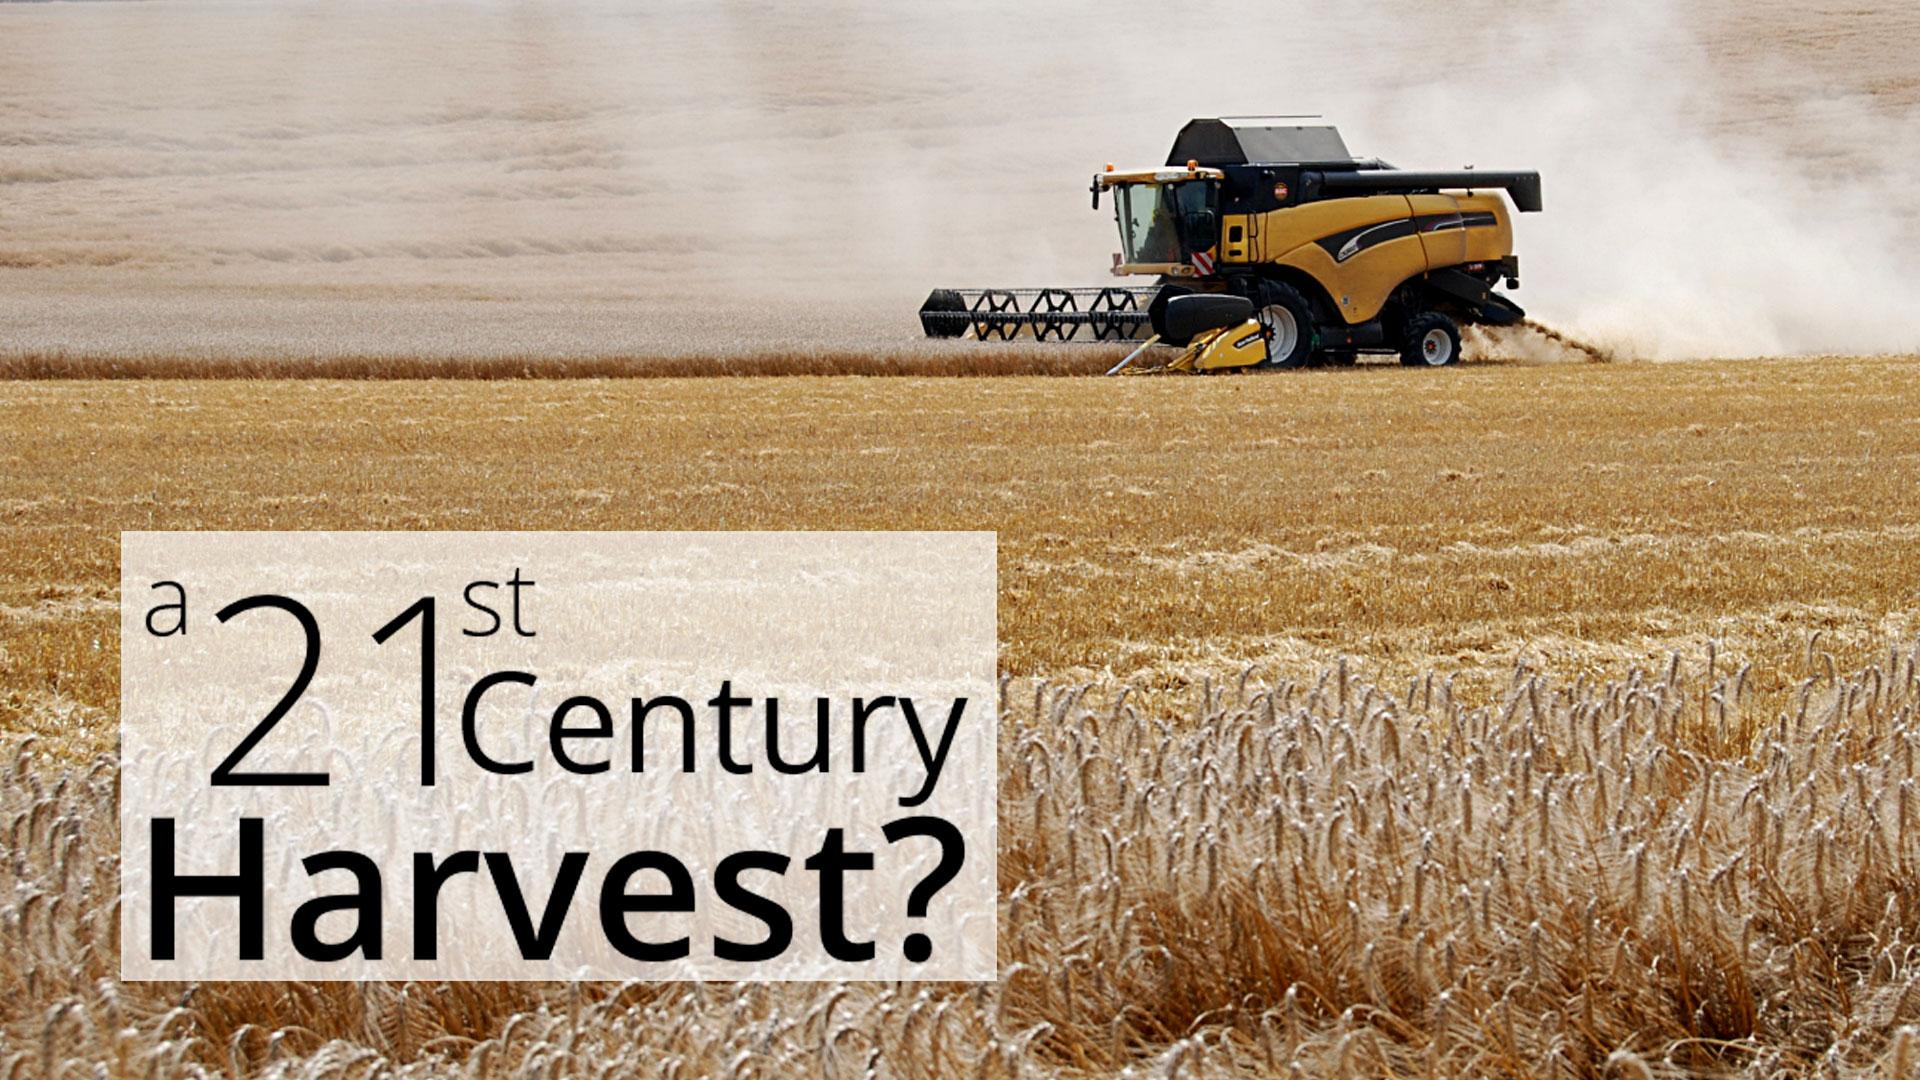 A 21st Century Harvest?